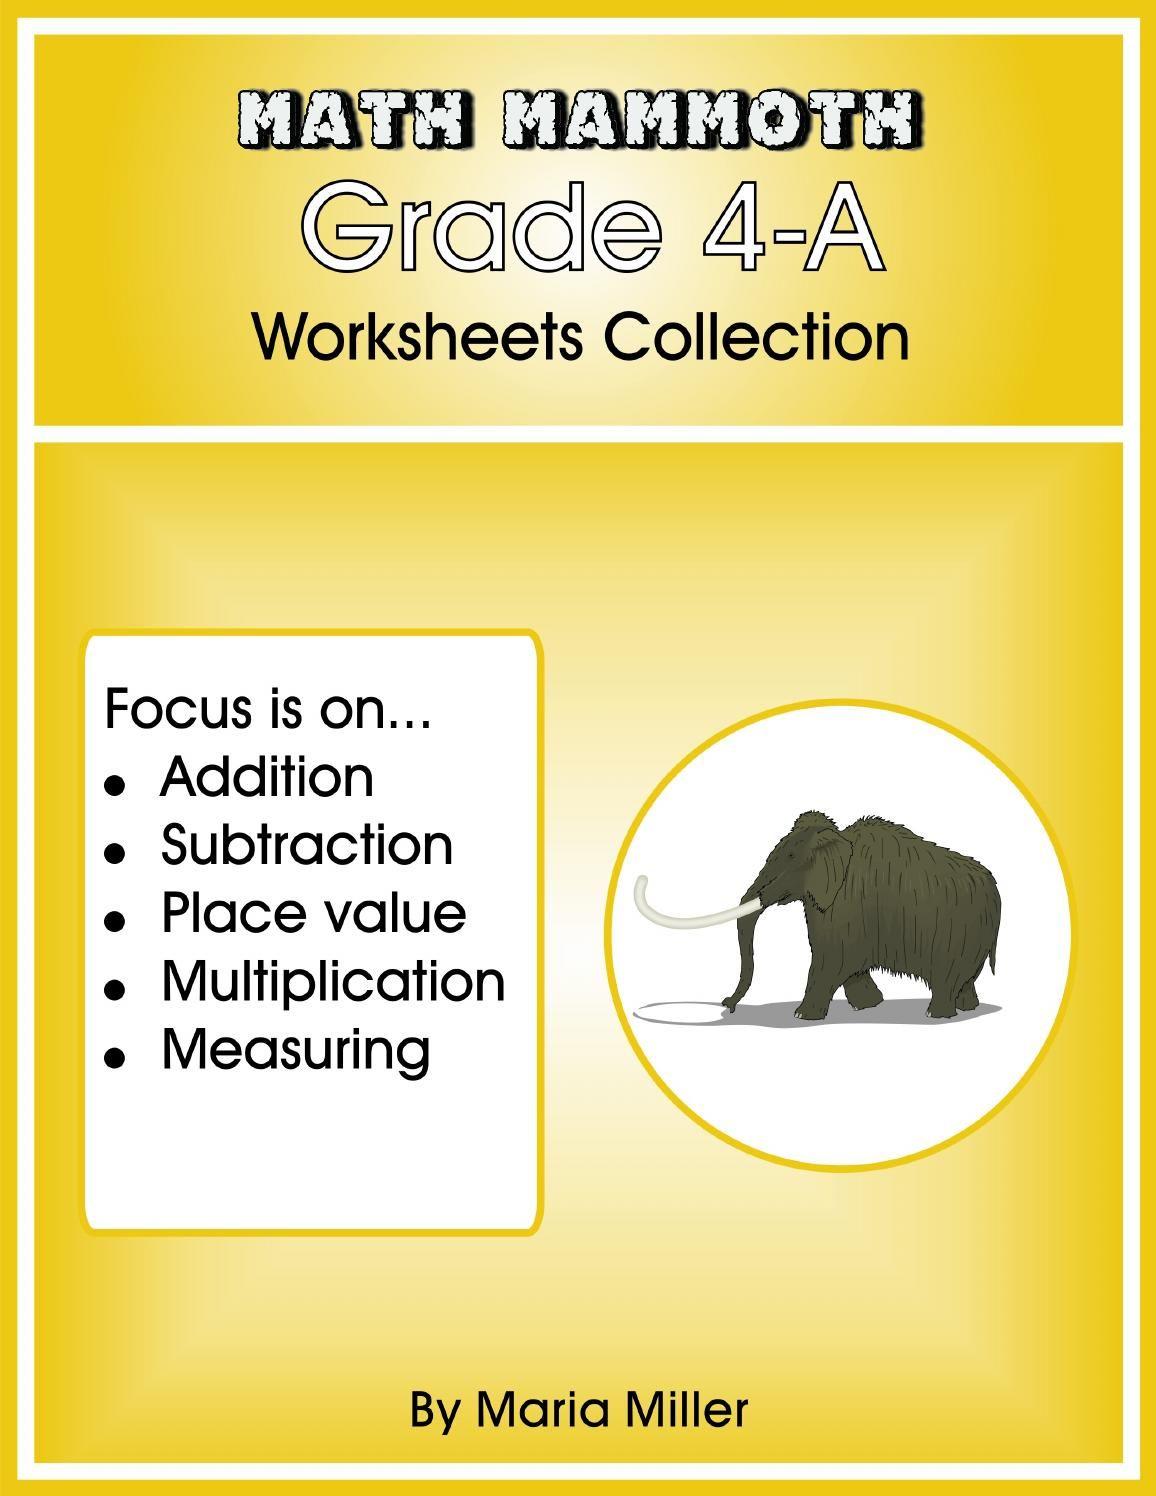 Grade 4a Worksheets